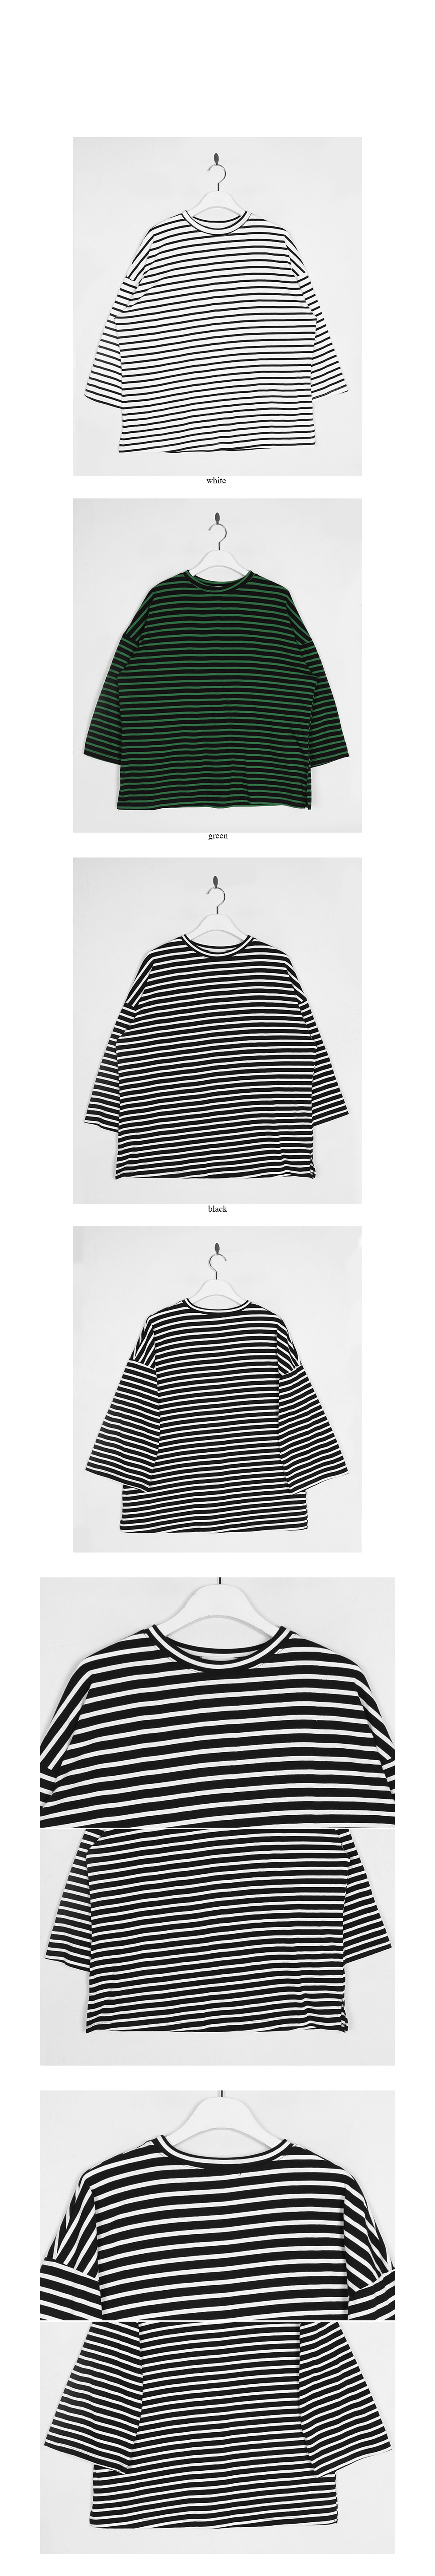 stripe pattern oversized t-shirt